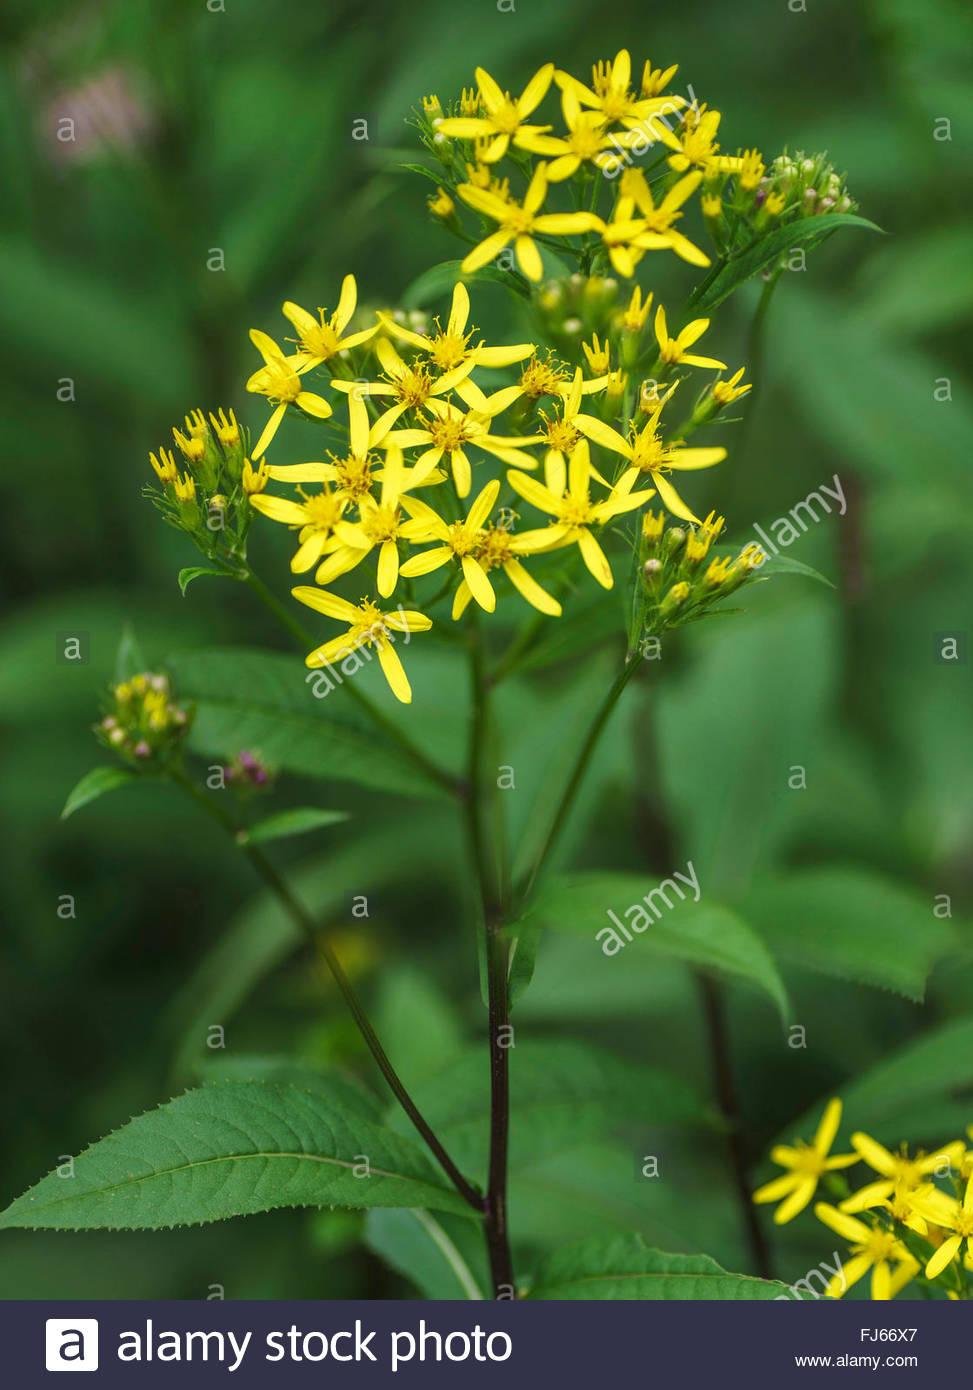 Senecio Ovatus (senecio Ovatus, Senecio Fuchsii), Inflorescence.